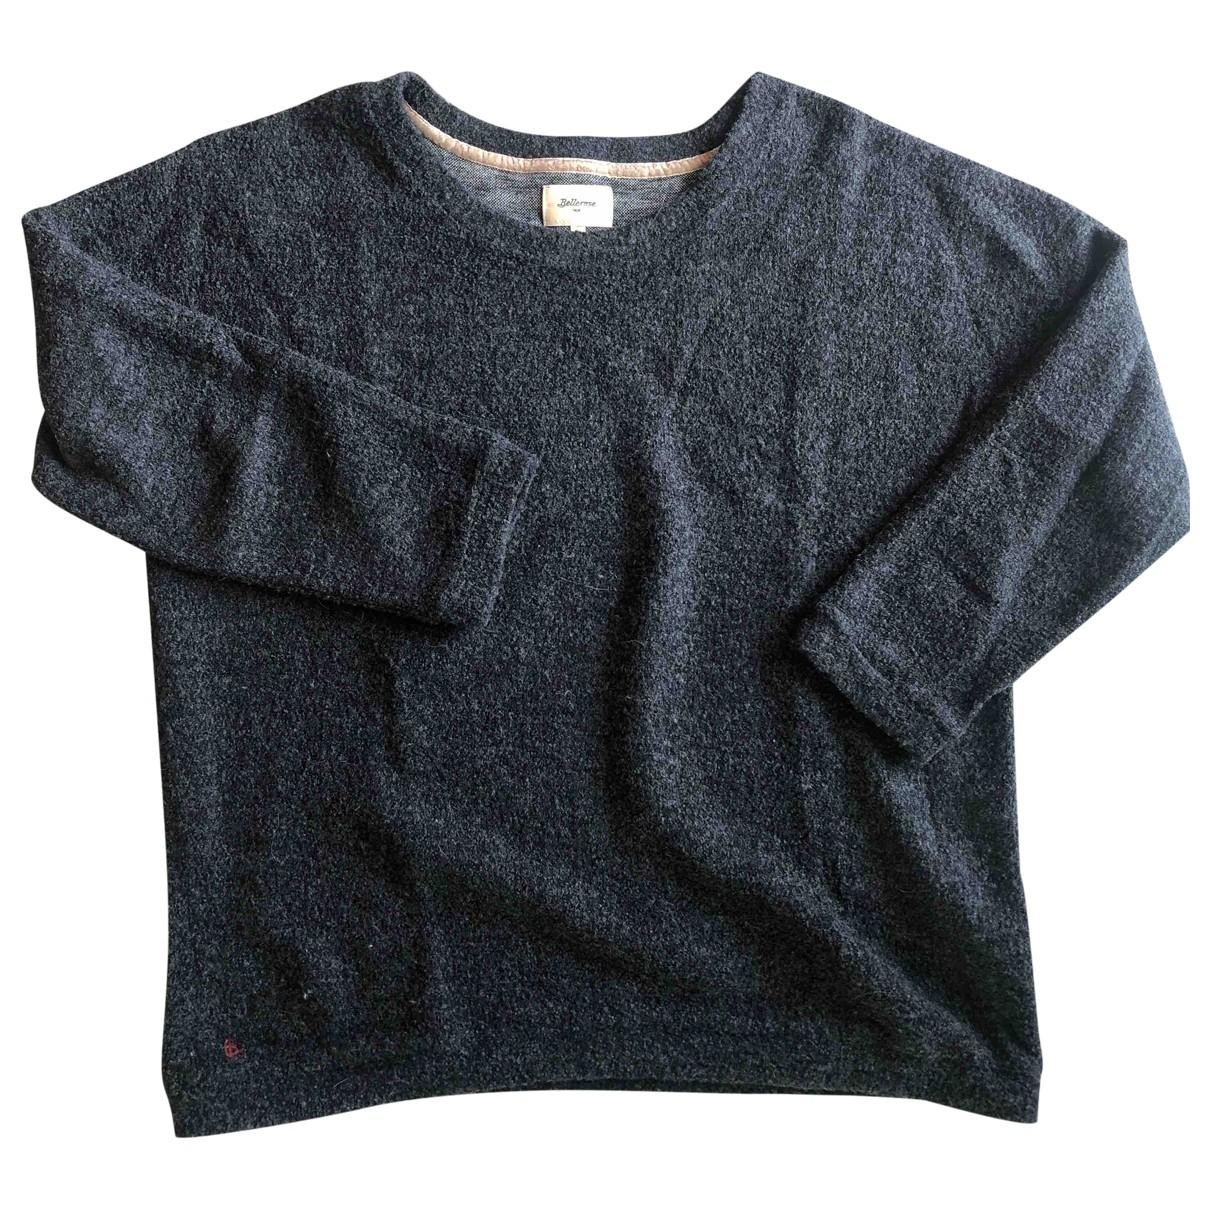 Bellerose \N Pullover in  Anthrazit Baumwolle